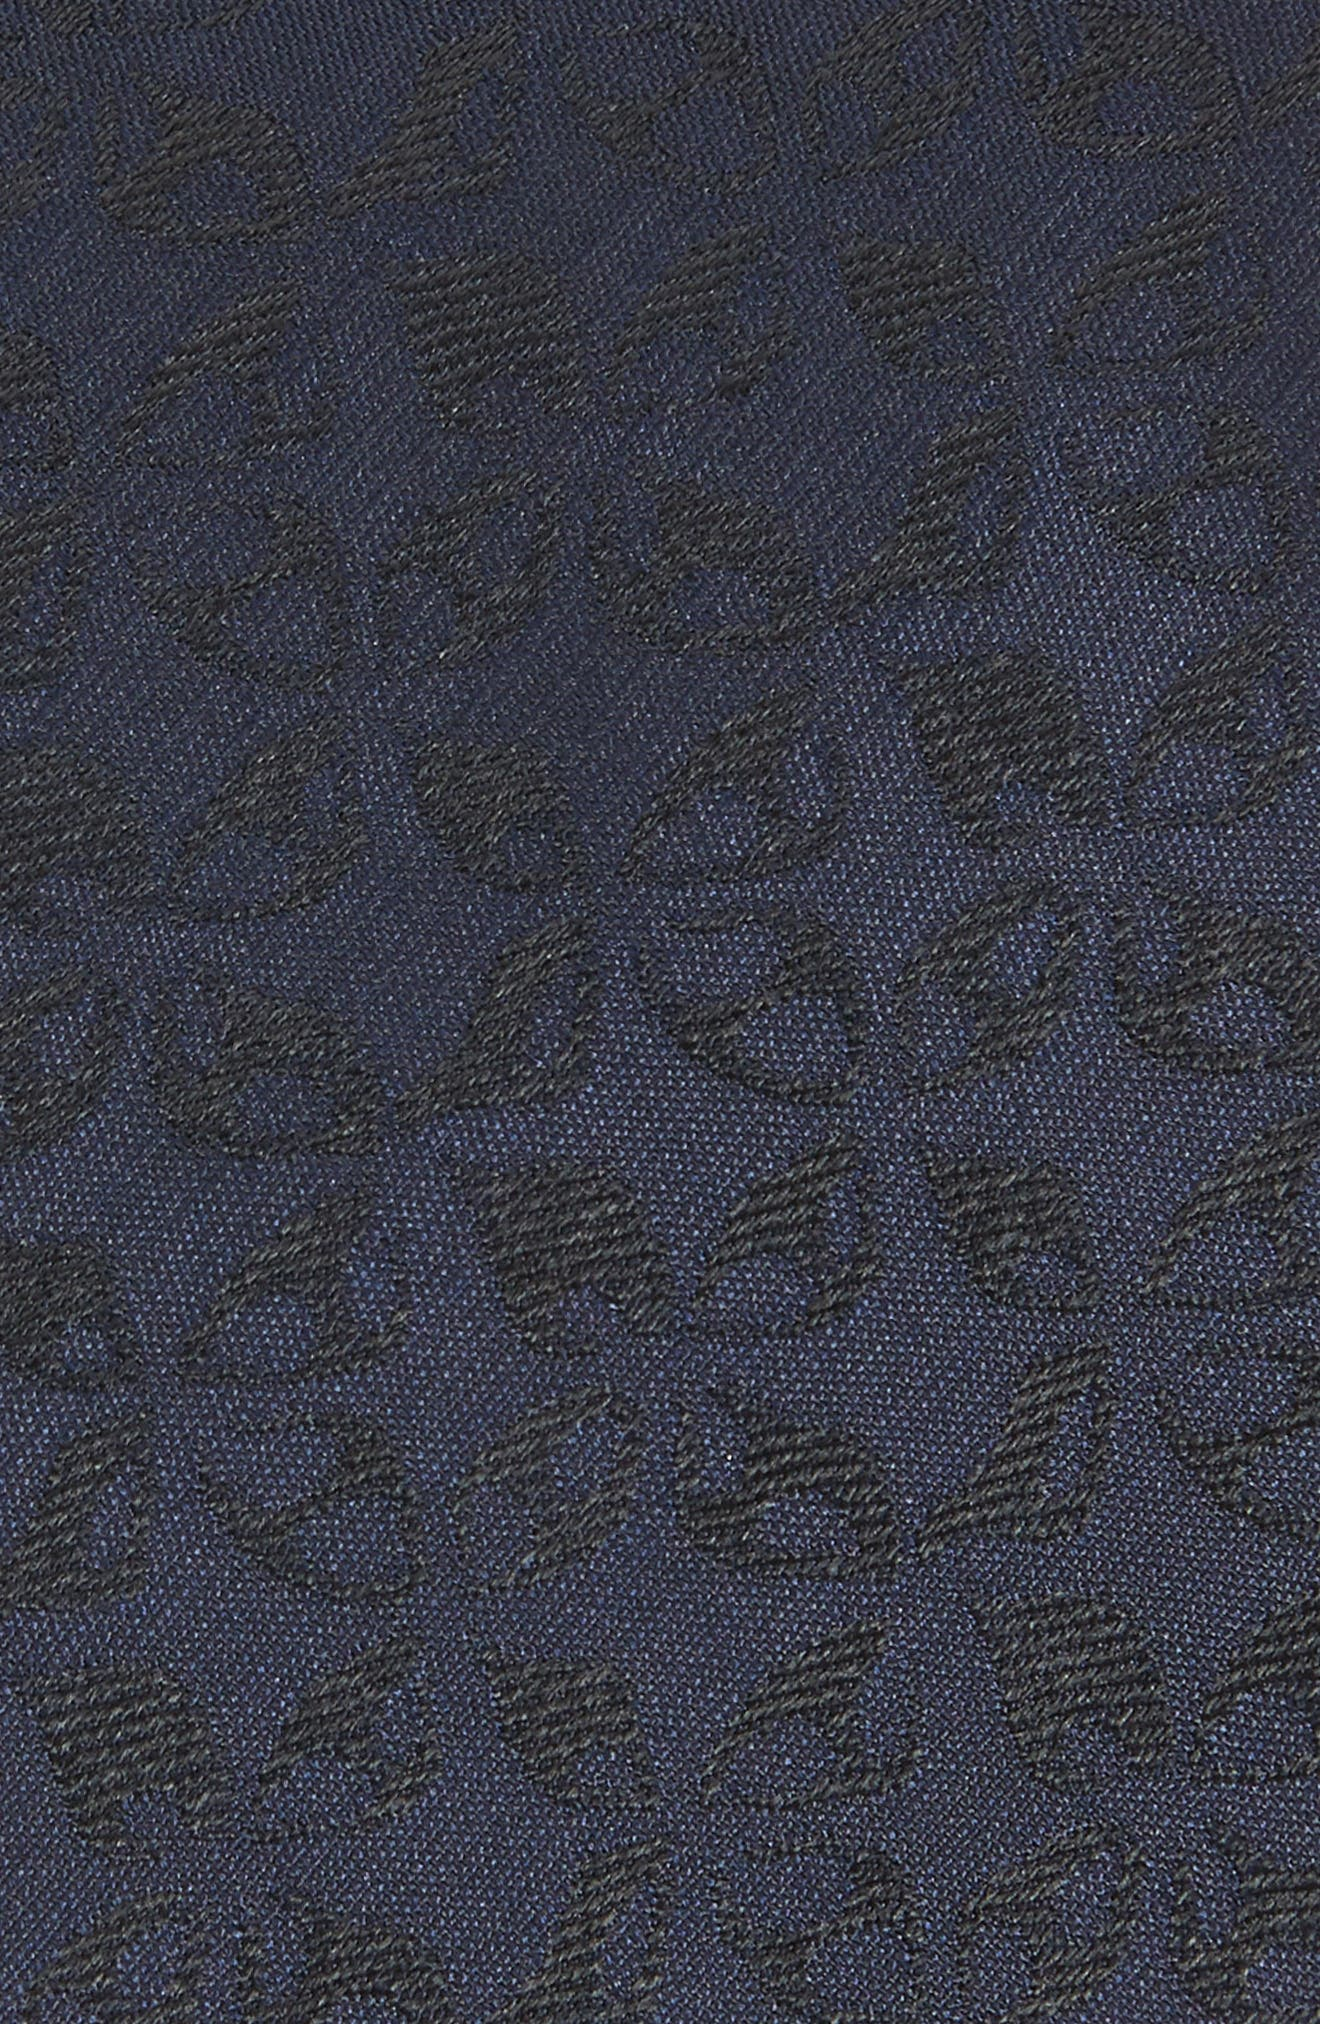 Floral Silk Tie,                             Alternate thumbnail 2, color,                             414